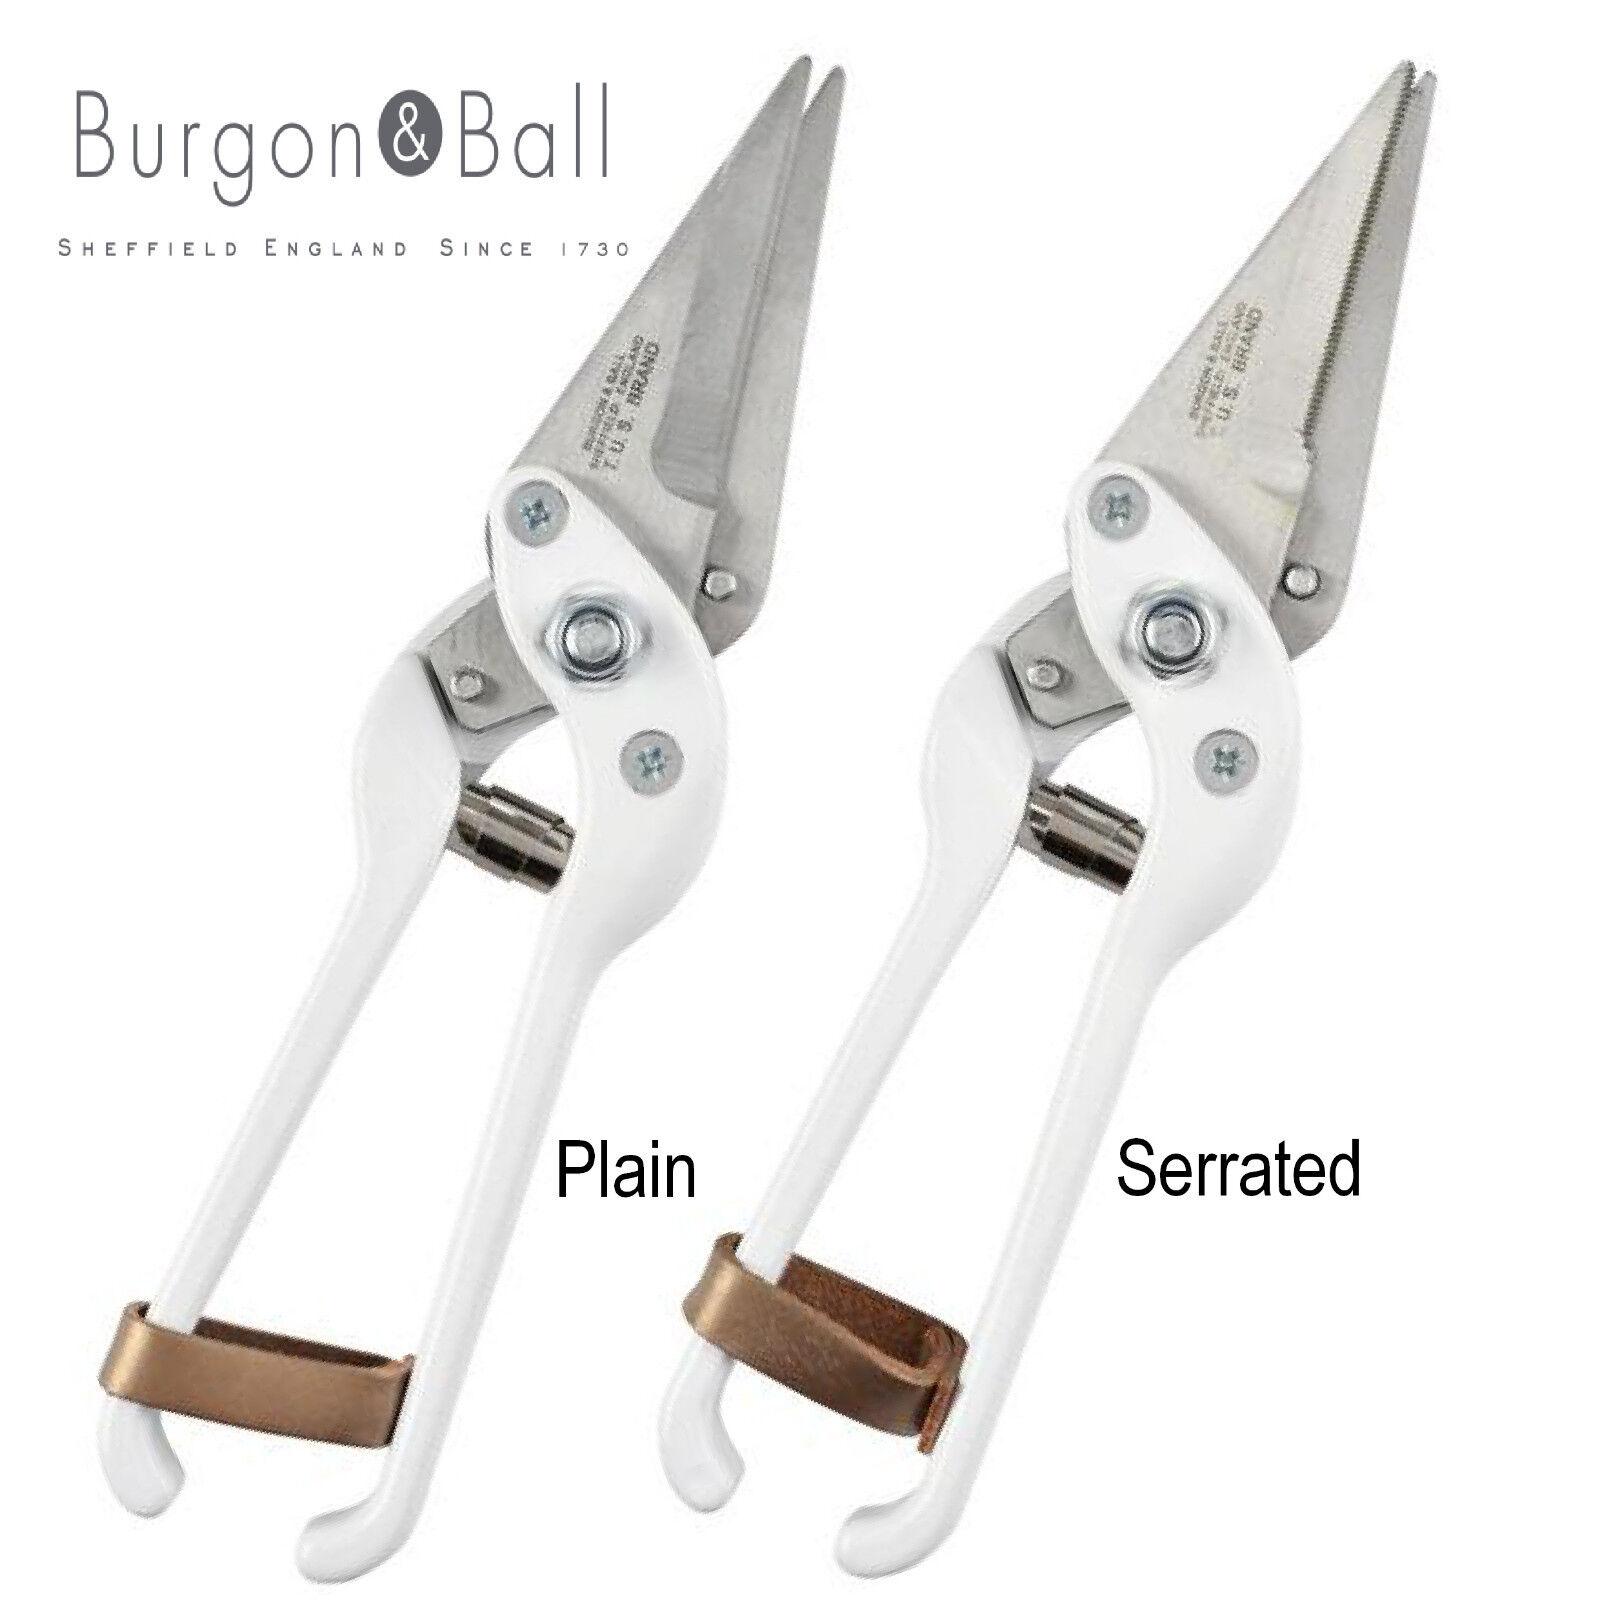 Burgon & Ball Footred Heavy Duty Foot Shears - Plain or Serrated